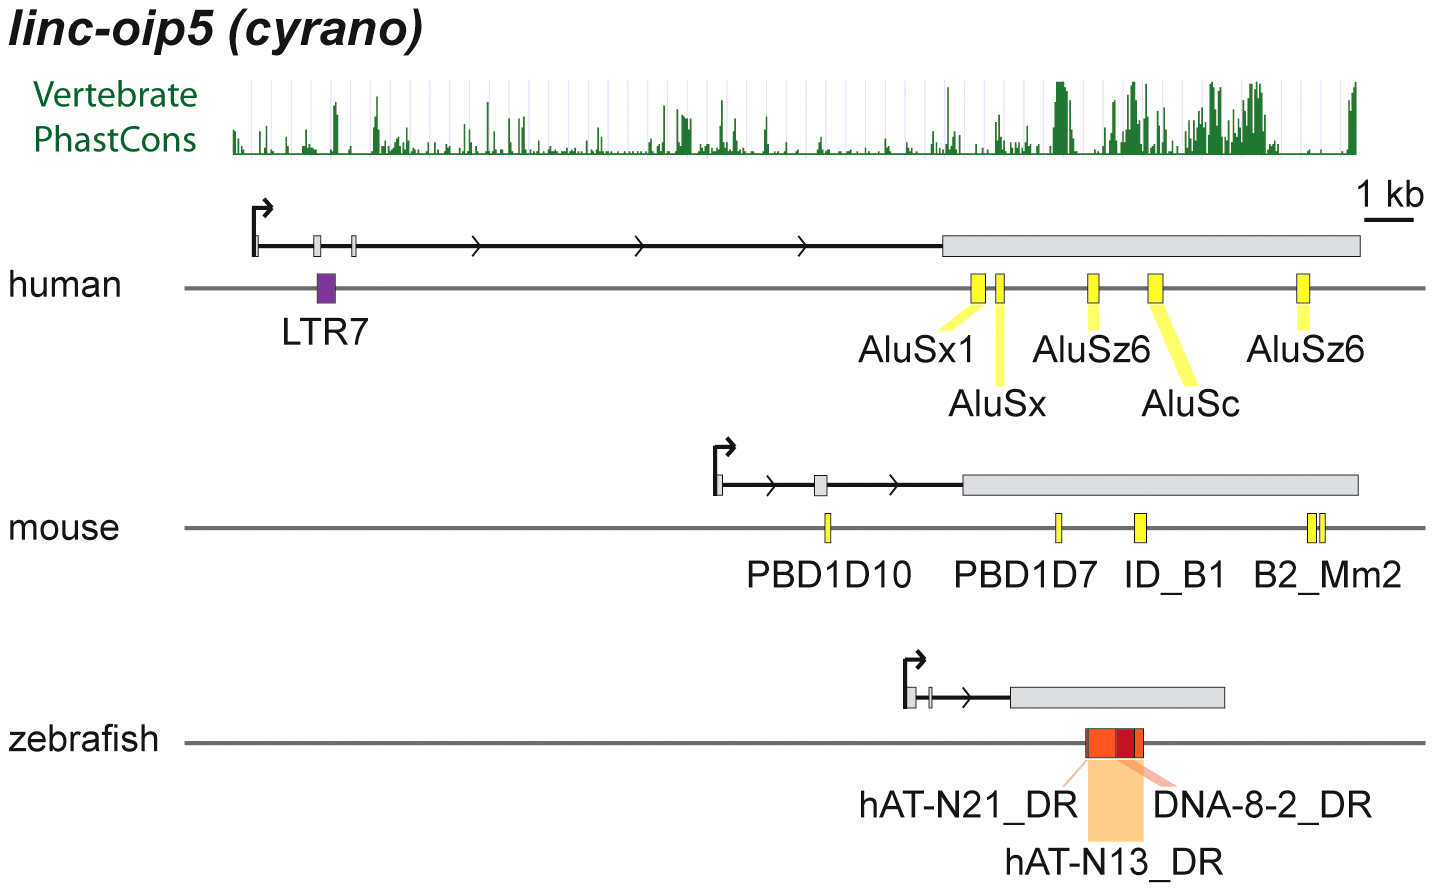 Lineage-specific TE insertions in <i>cyrano</i>.